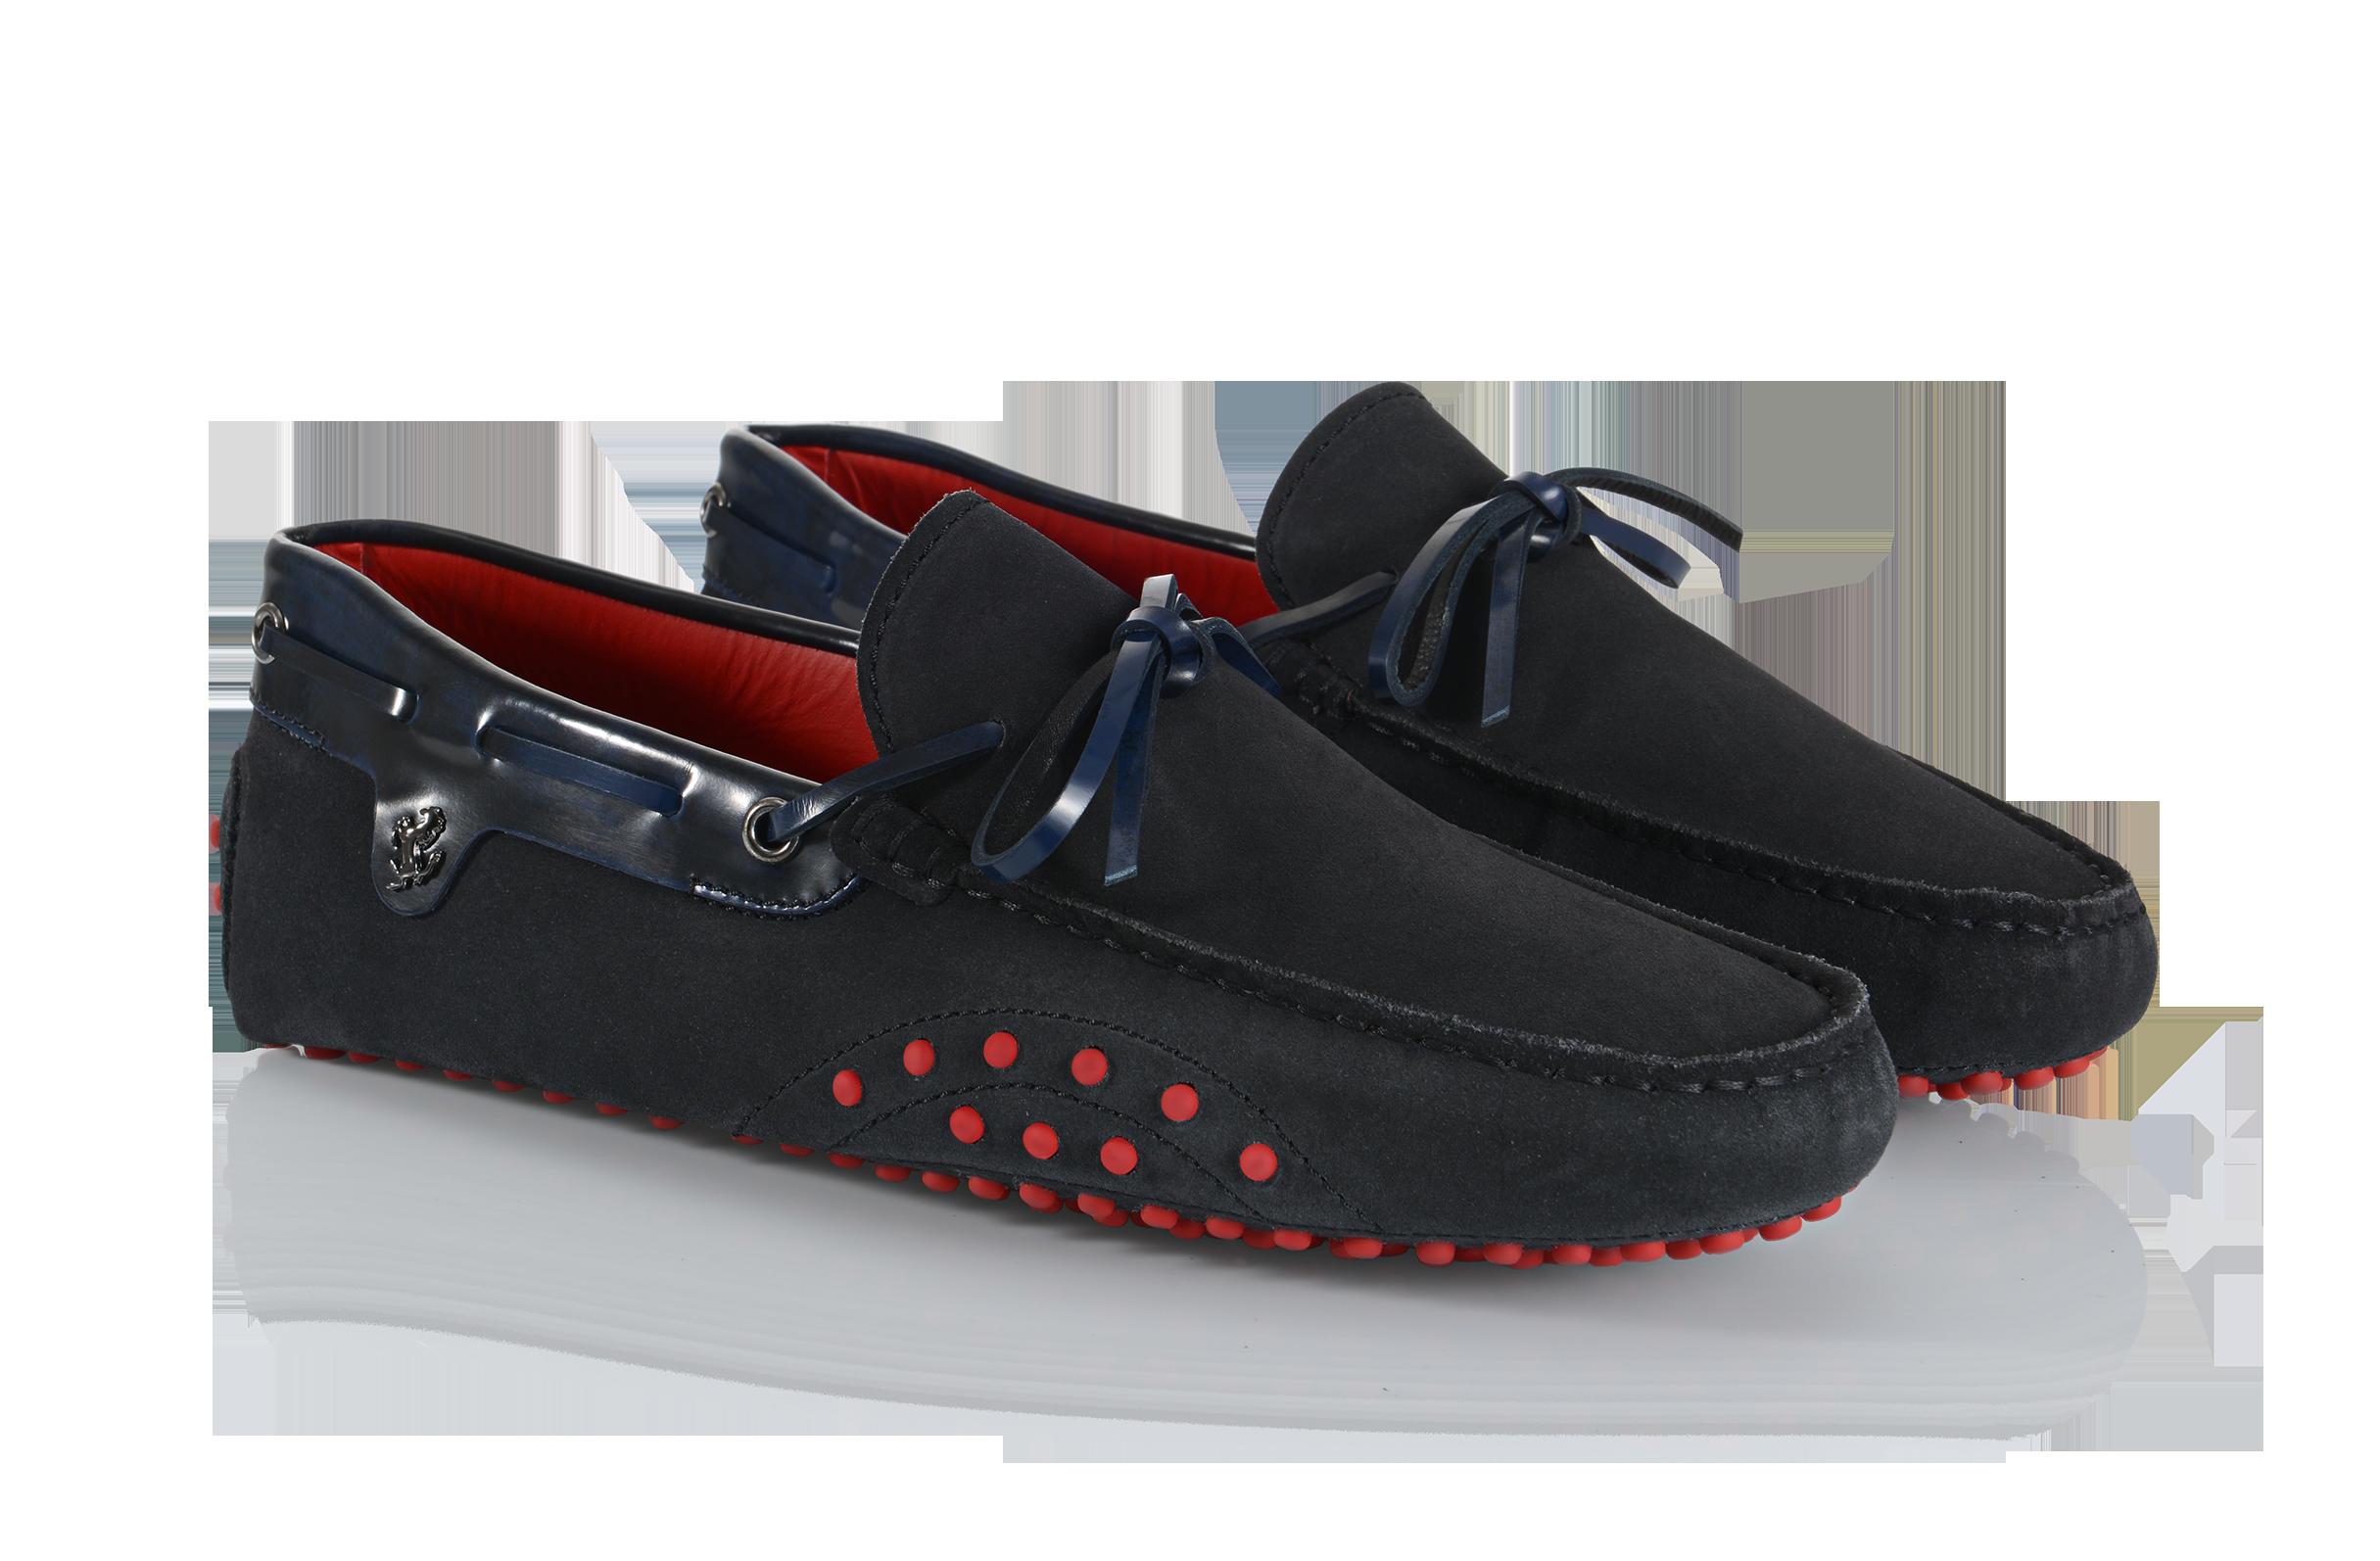 c712281f10e9c2 ... Shoes par Nara Chounramany. Gommino Mocassin Ferrari En Daim, All, Tod's  For Ferrari, Shop Homme.